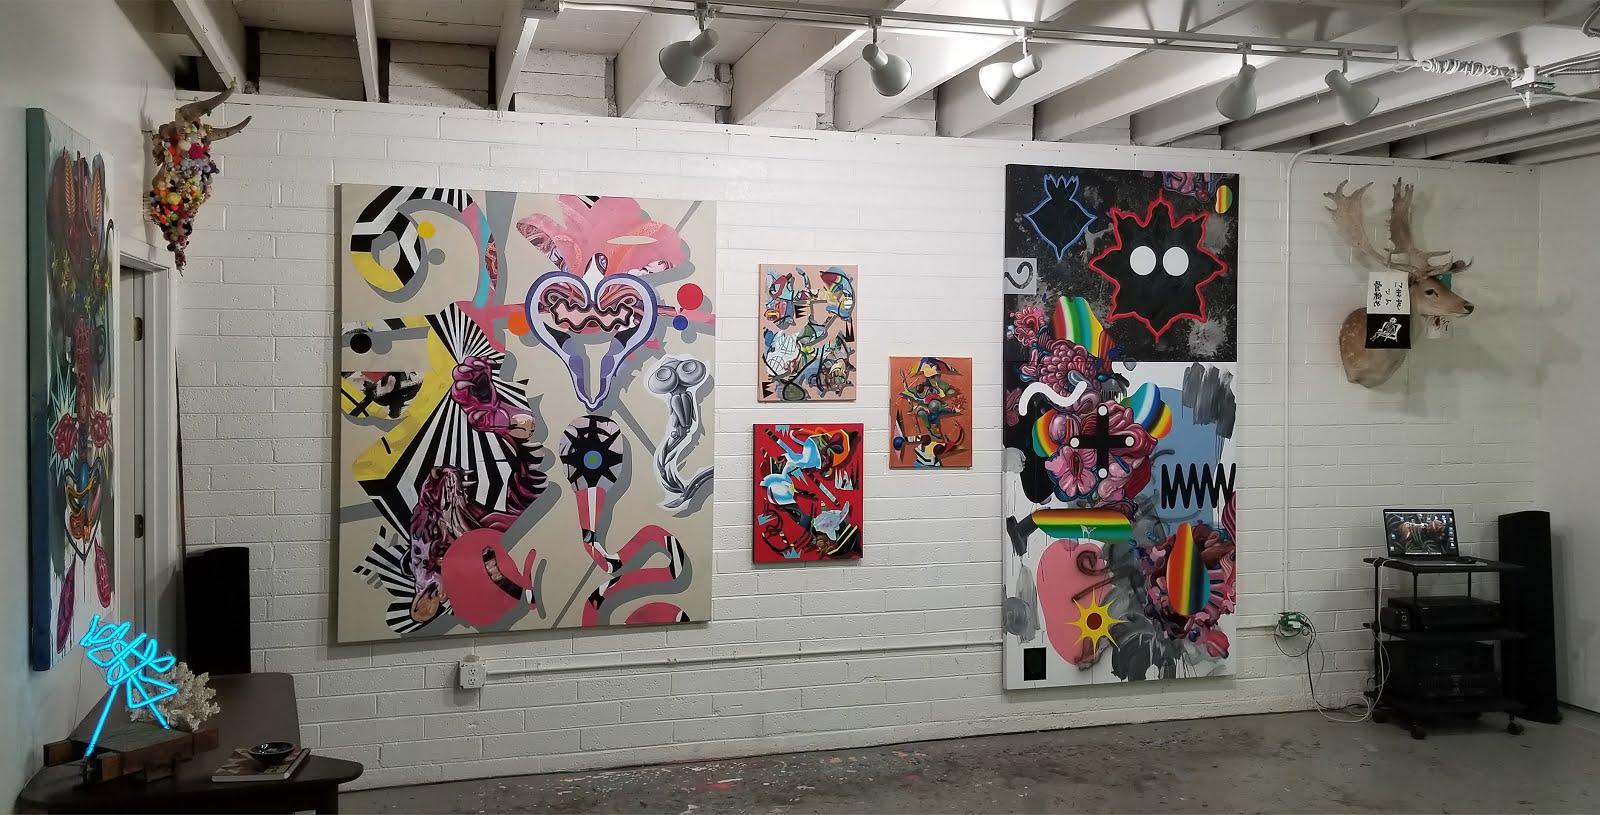 BILL DAMBROVA: ARTIST